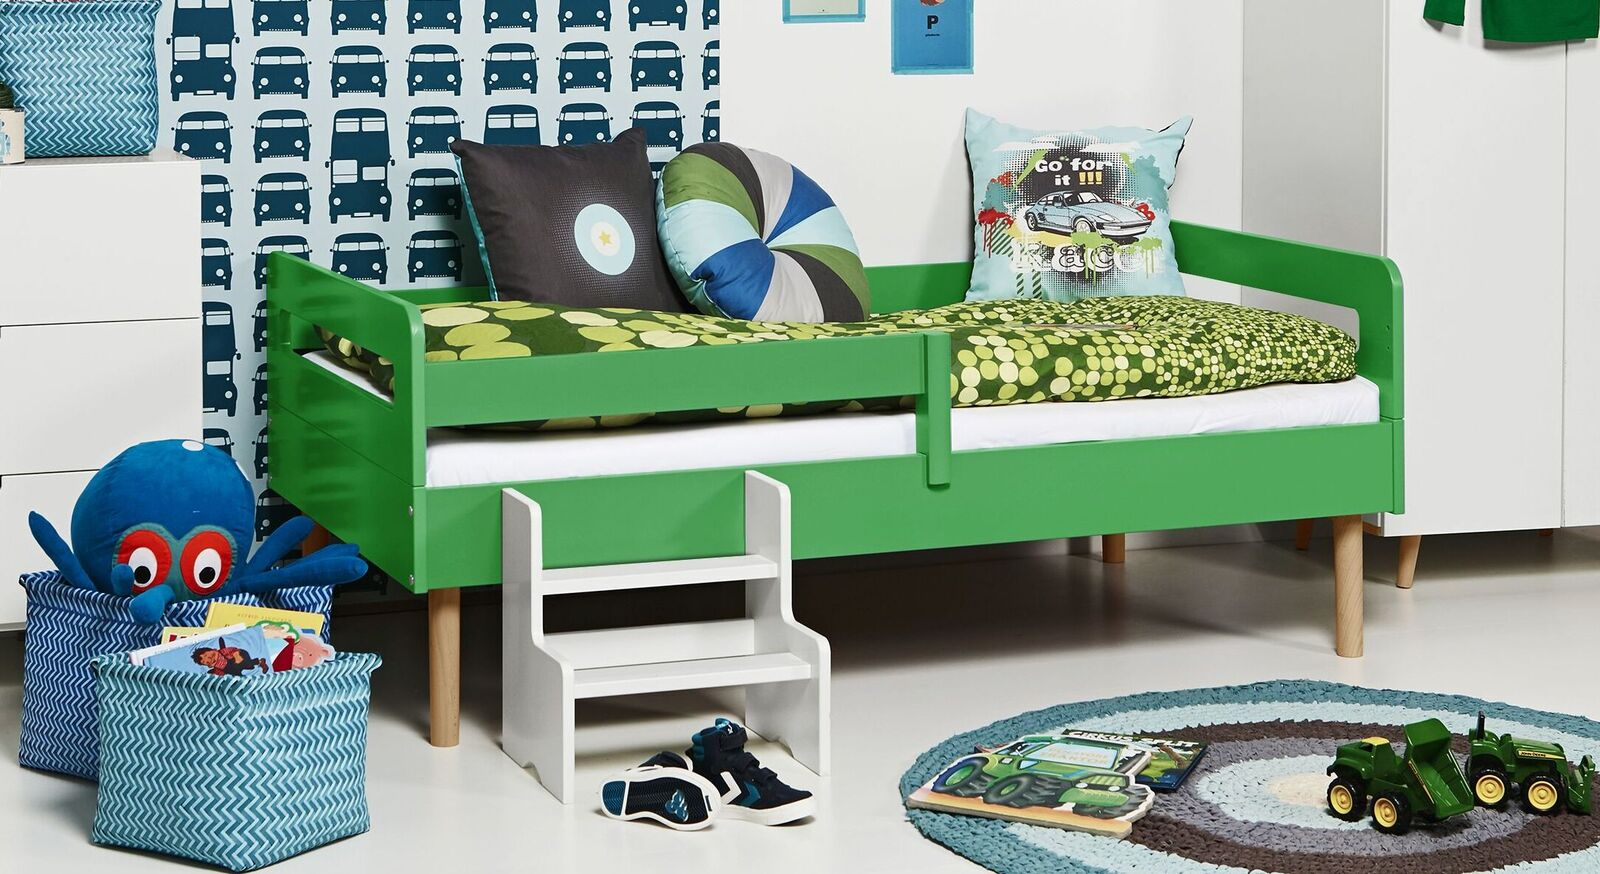 Modernes Kinderbett Kids Town Retro aus grünem MDF